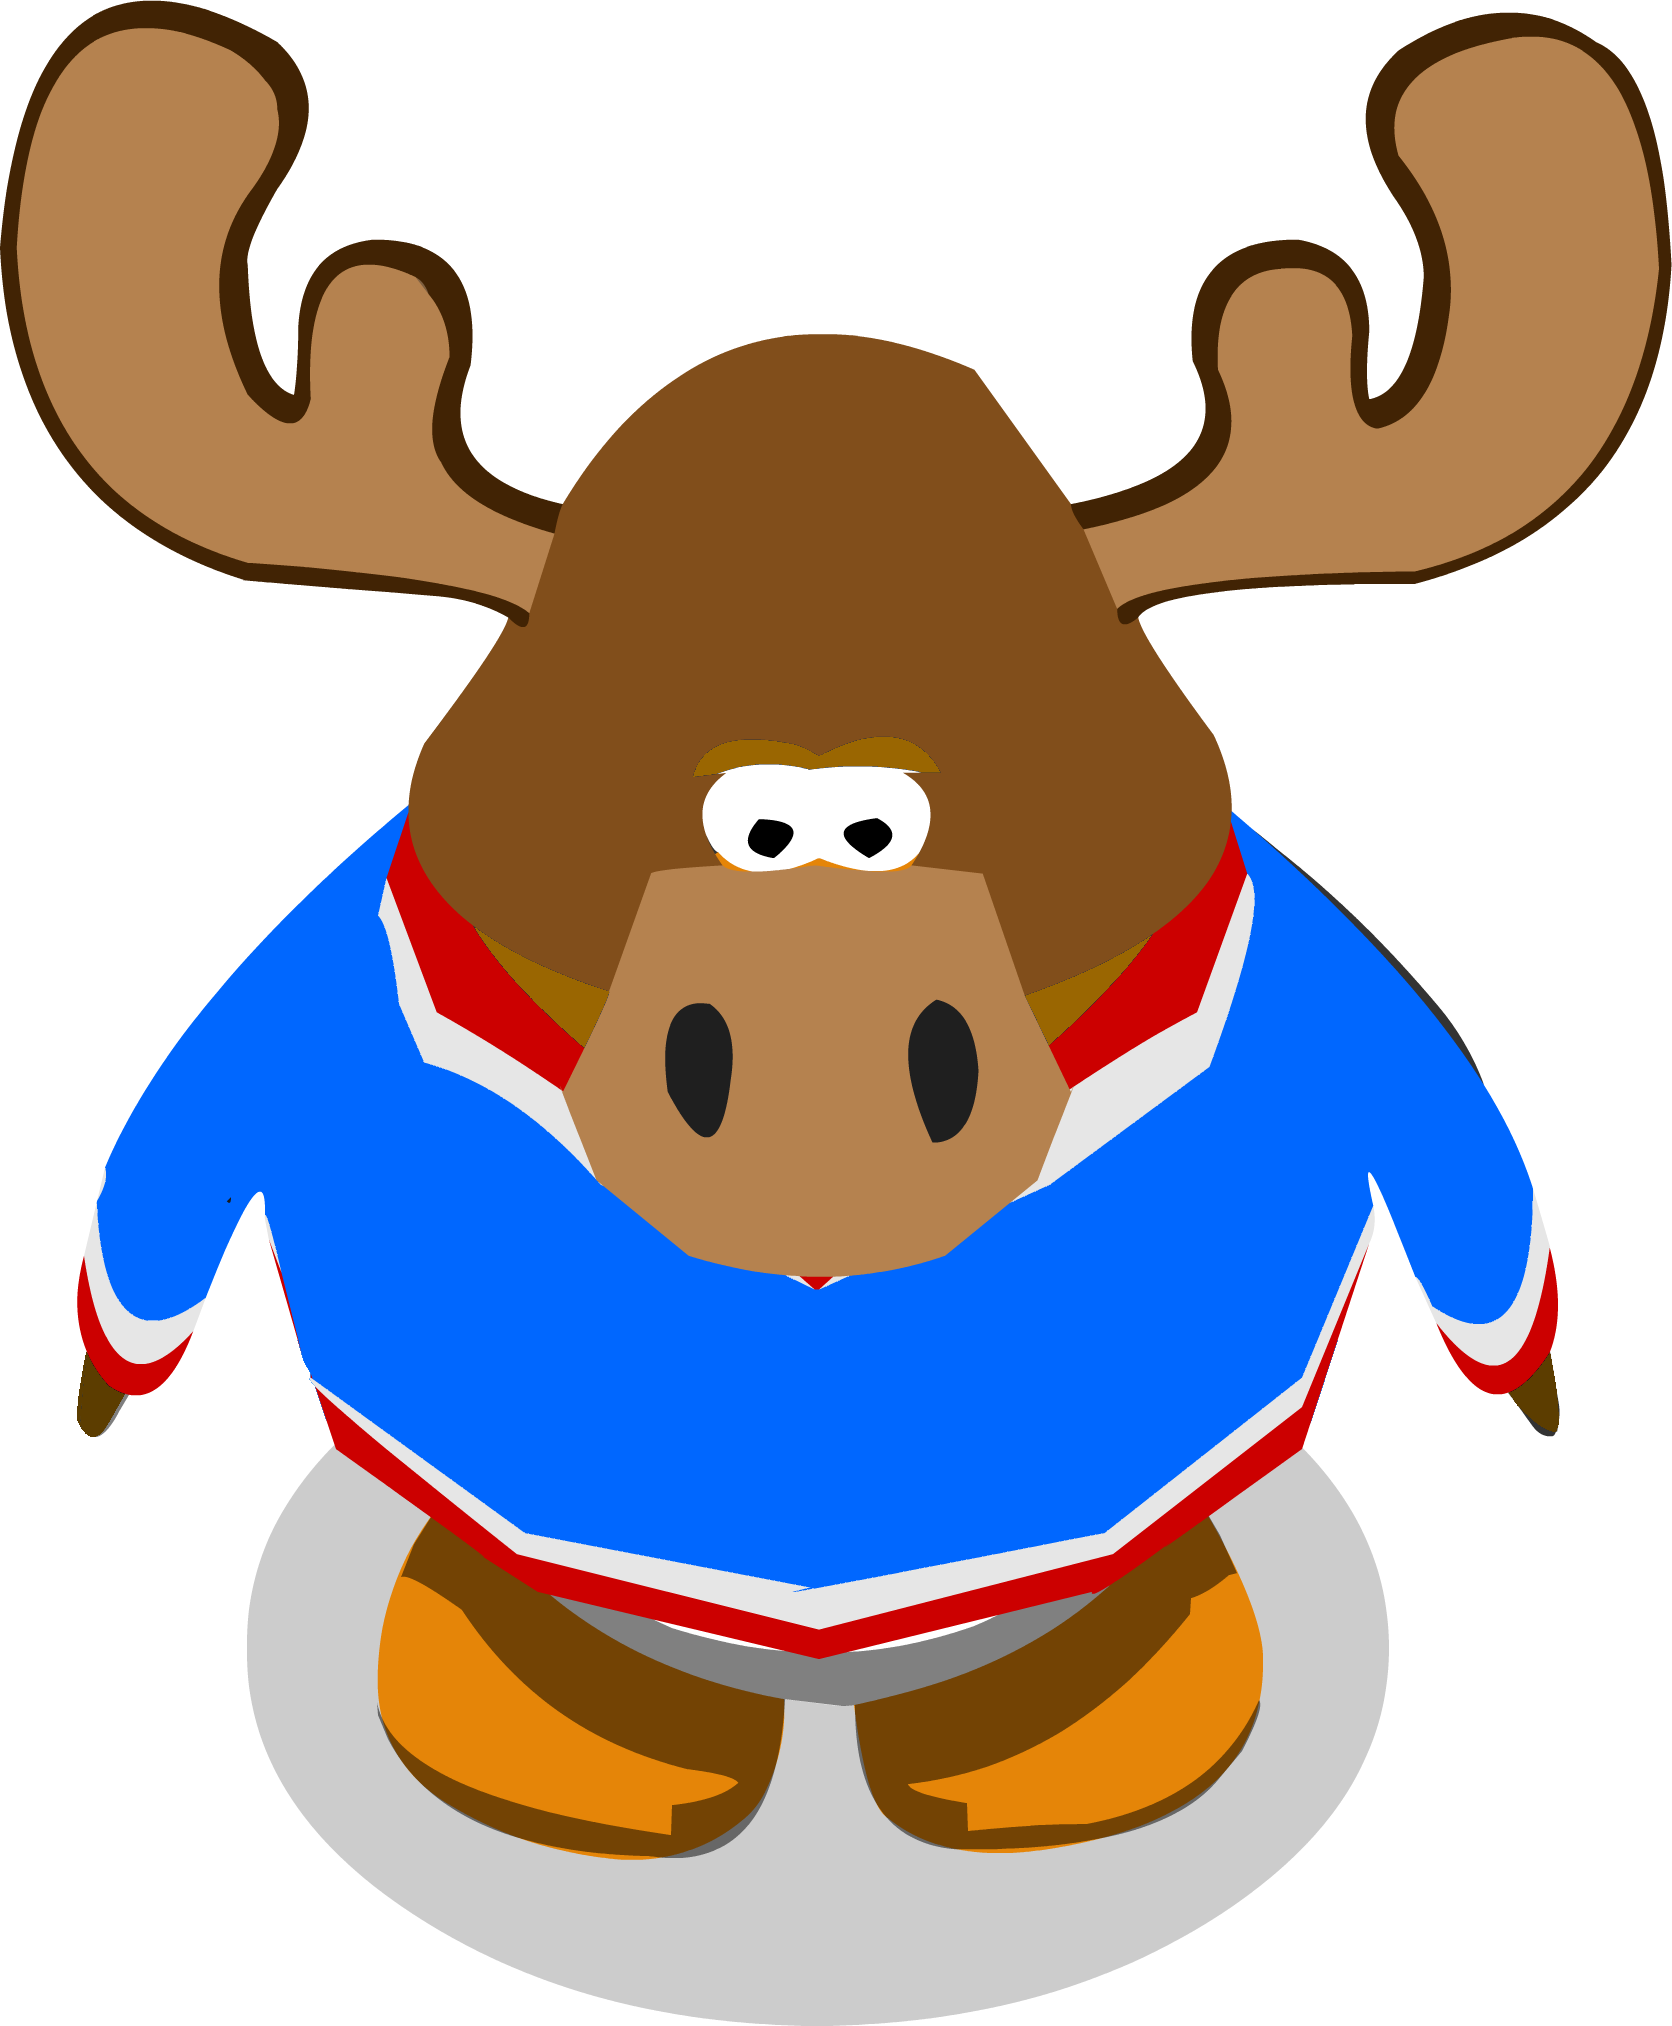 Zeus the Moose